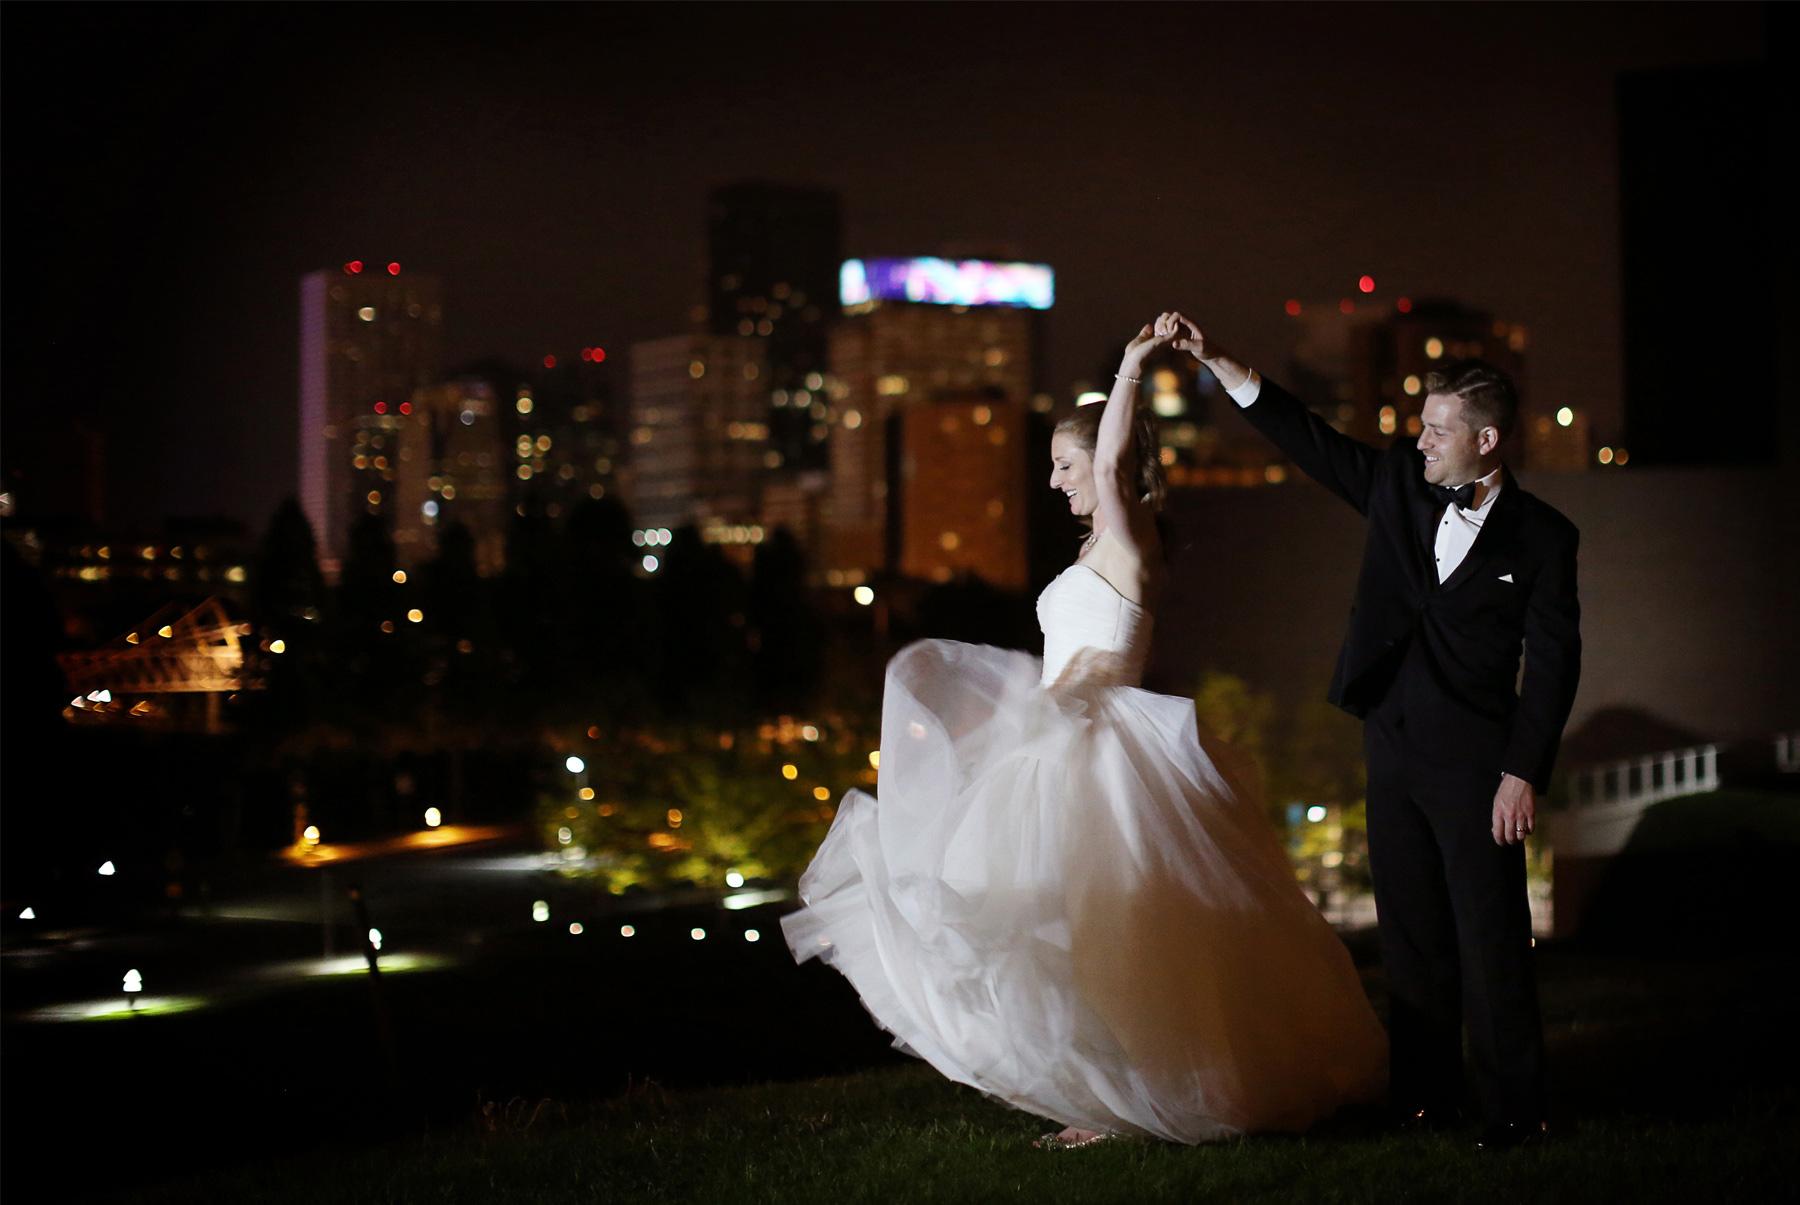 19-Minneapolis-Minnesota-Wedding-Photography-by-Vick-Photography--Walker-Sculpture-Garden-Outdoor-Night-Photos.jpg